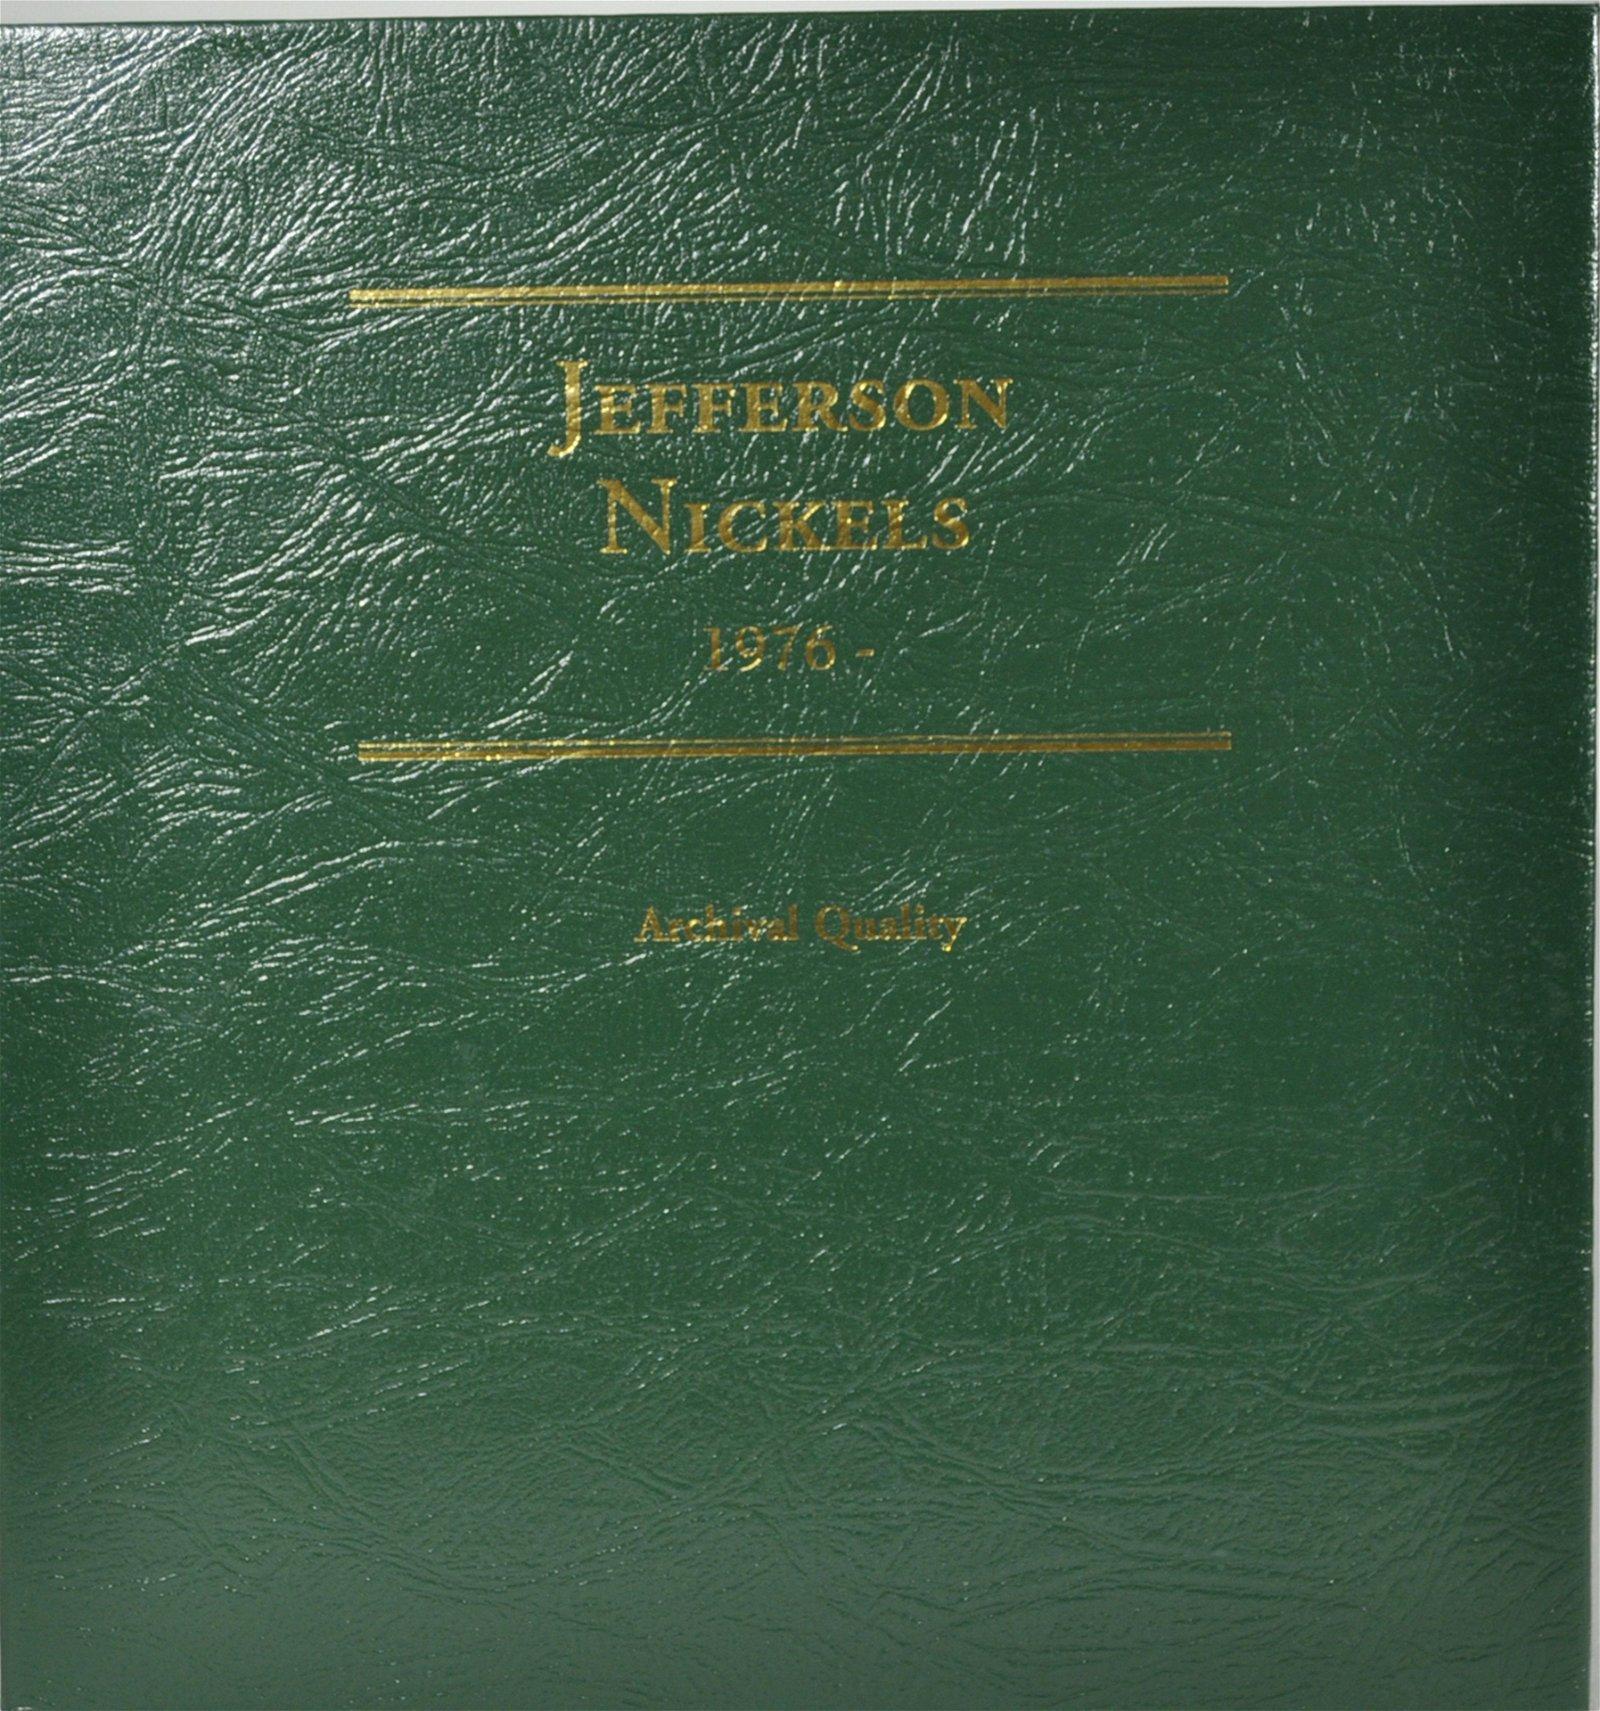 99) Jefferson Nickels 1976-2006 Unc / Ms / Proof